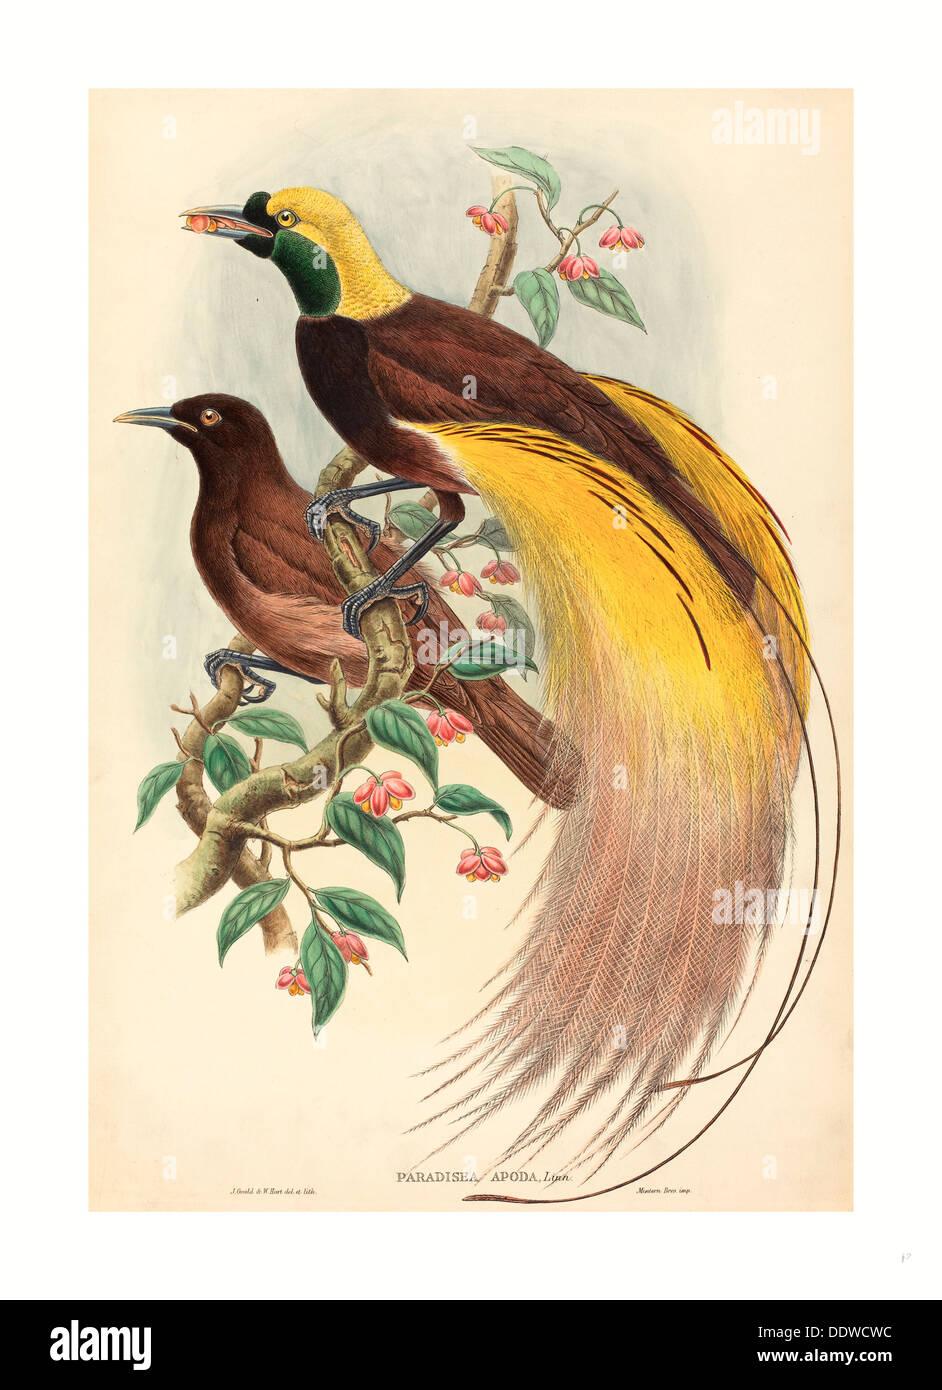 John Gould und W. Hart (Britisch, 1804-1881), Bird Of Paradise (Paradisea Apoda), veröffentlicht 1875 1888, Stockbild